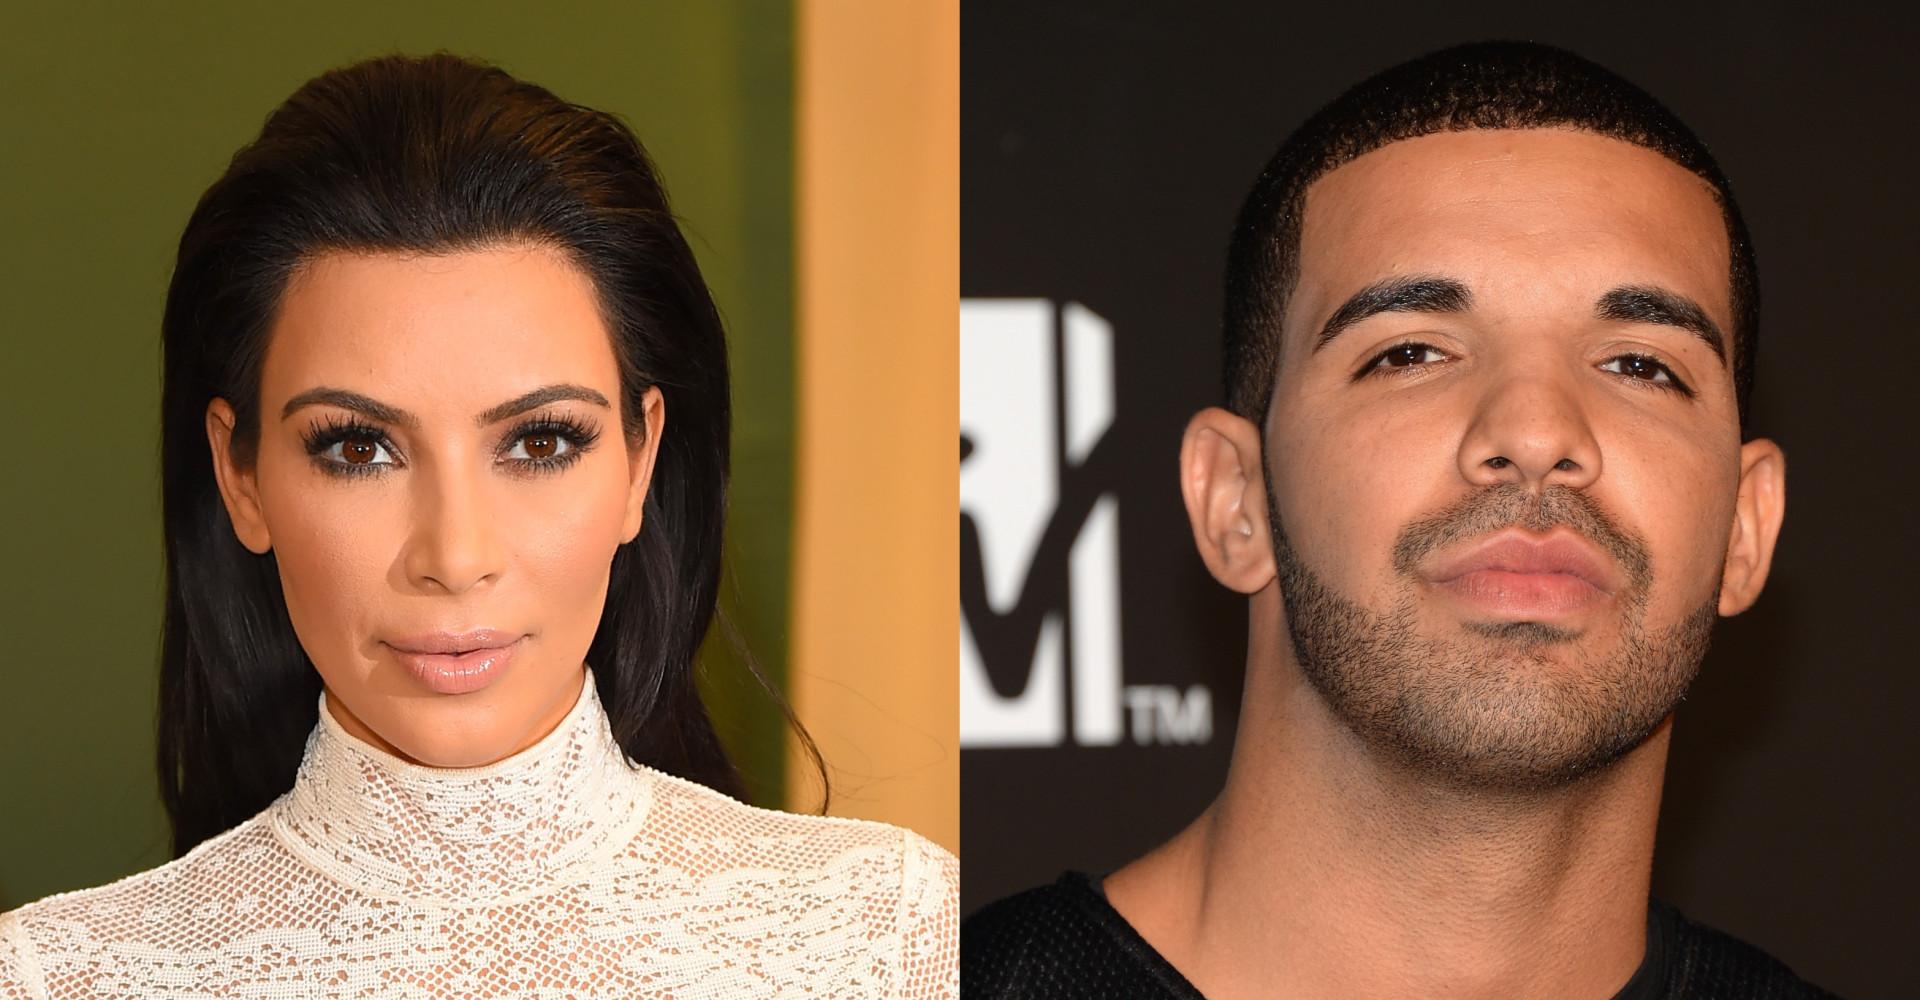 Did Kim Kardashian sleep with Drake? The star finally addresses rumors